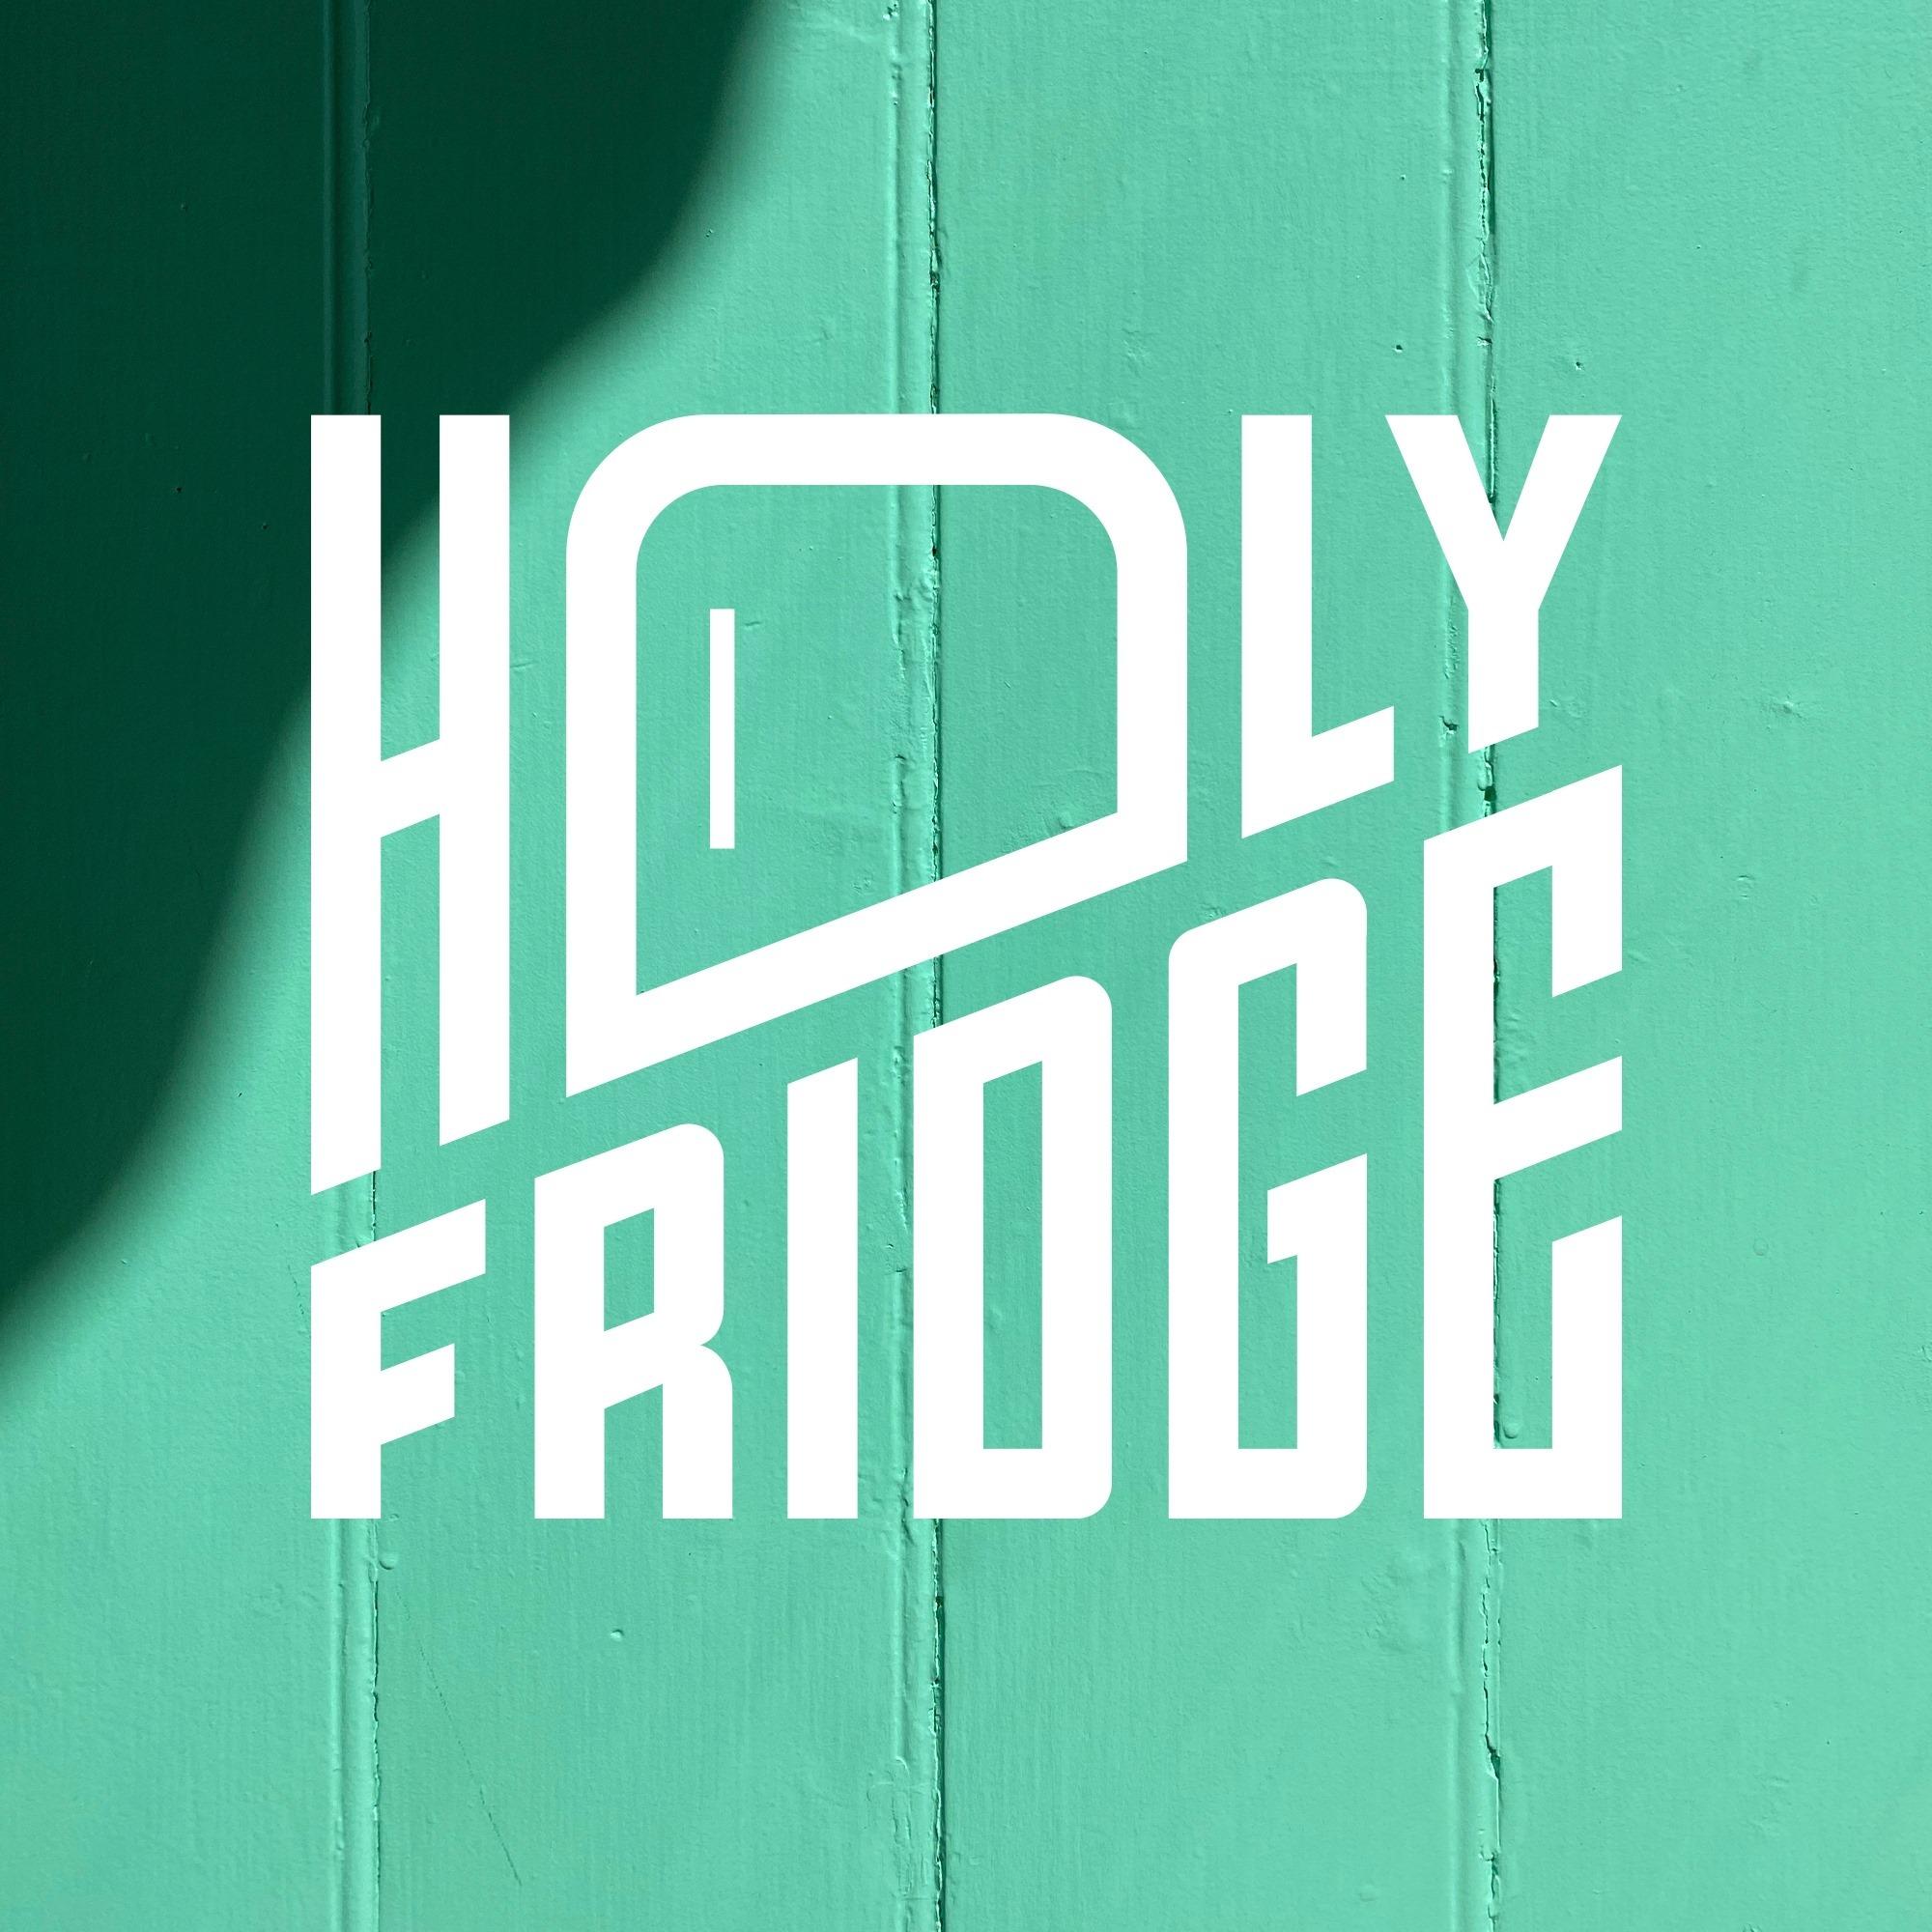 HolyFridge - Alarm, Overvågning og Vagt